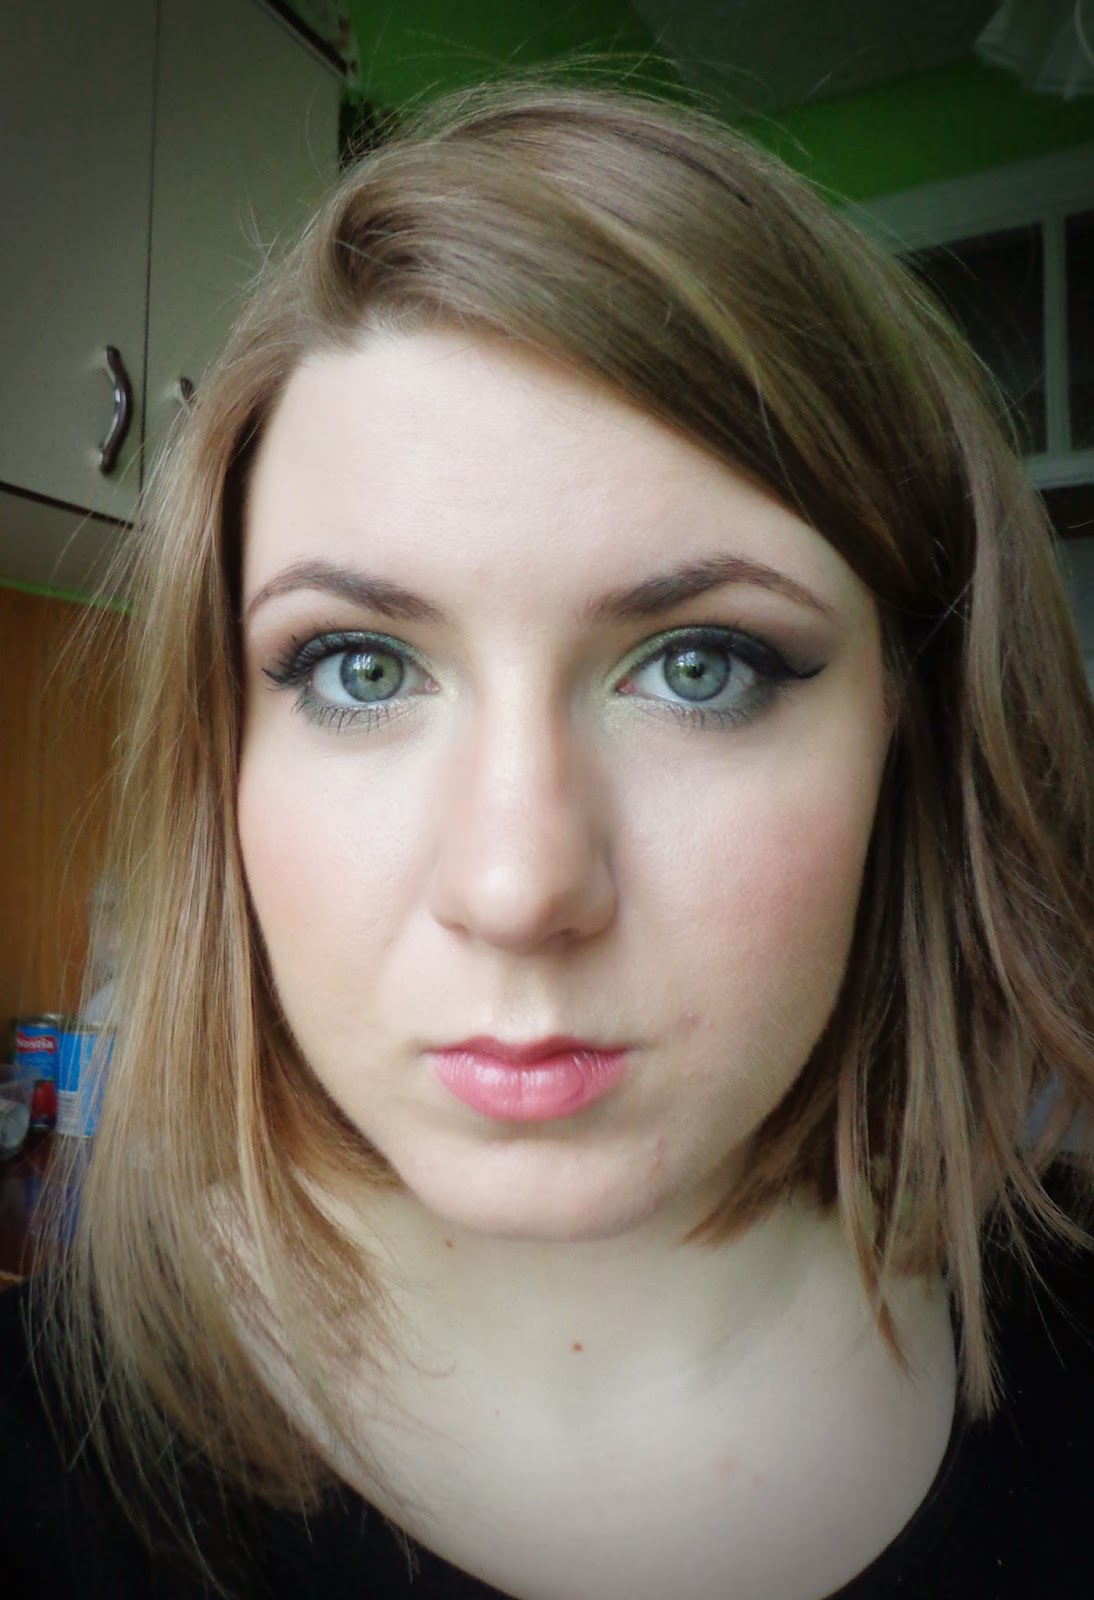 http://ka-em-makeup.blogspot.com/2014/05/makijaz-dzienny-troszke-mocniej.html#more